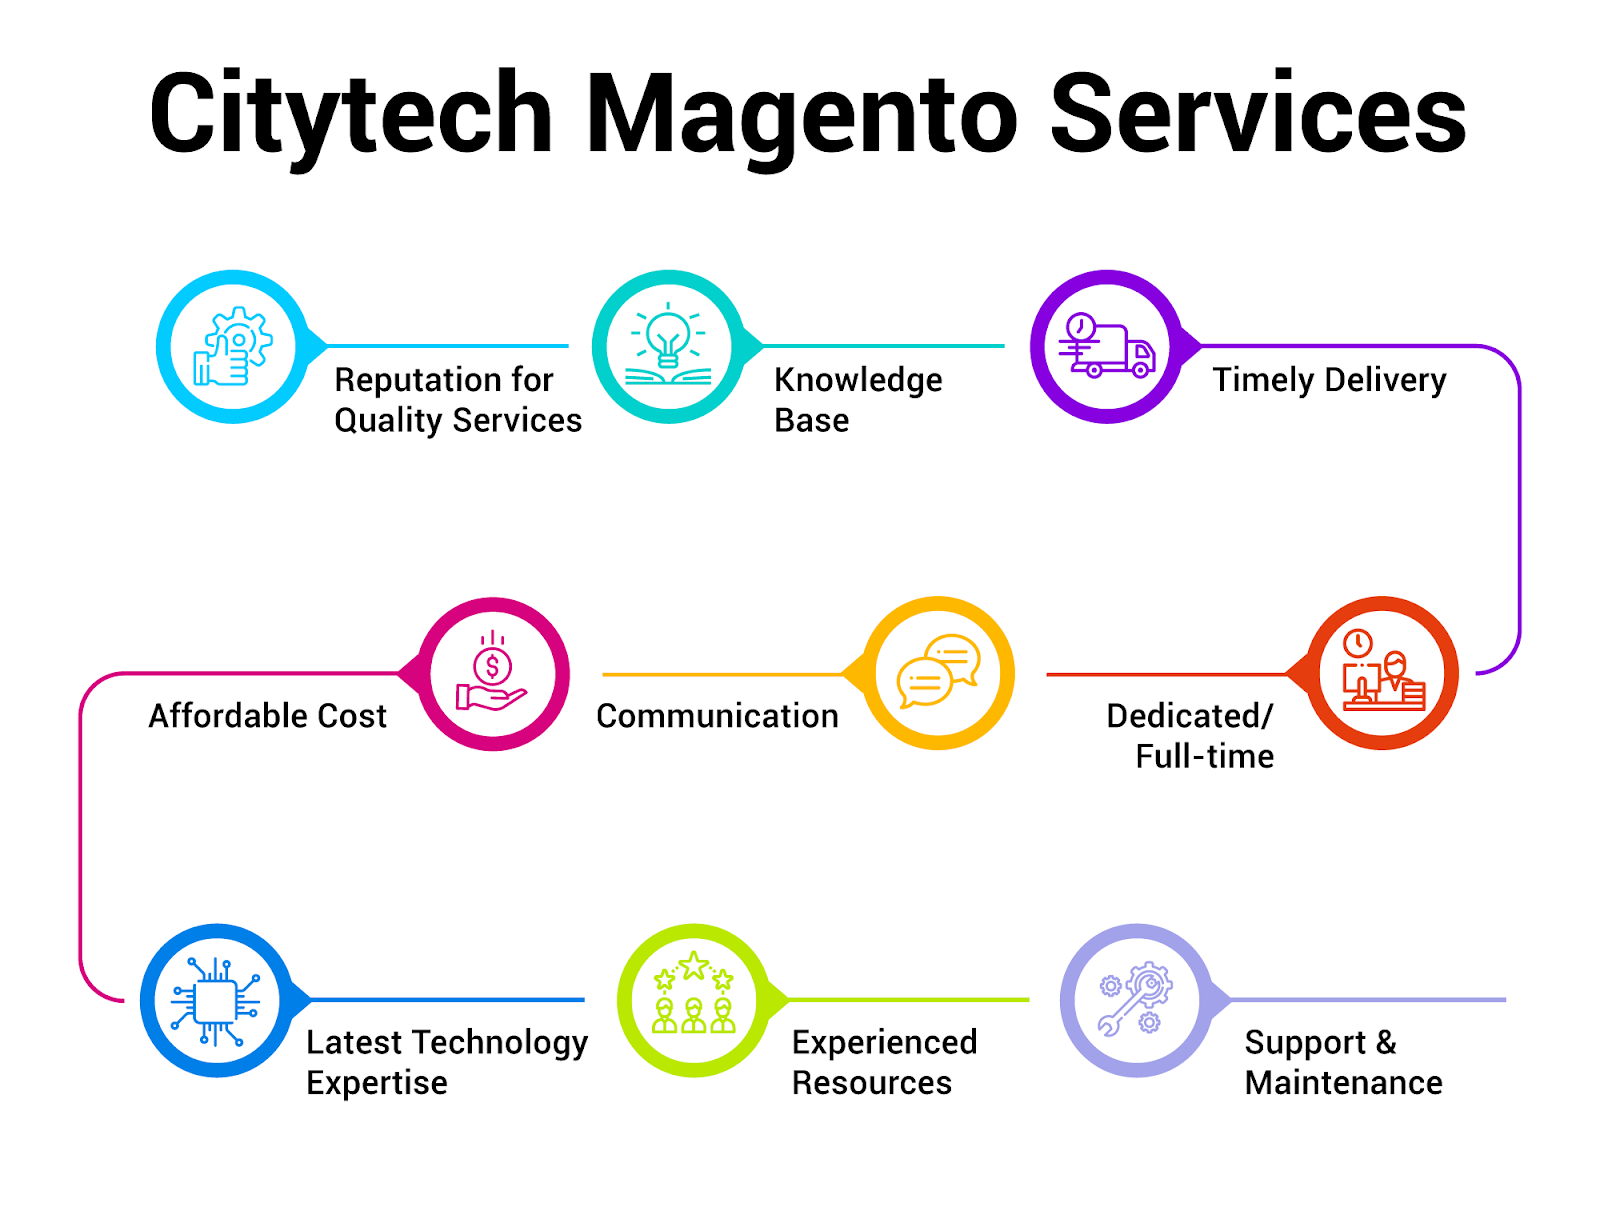 Citytech Magento Services